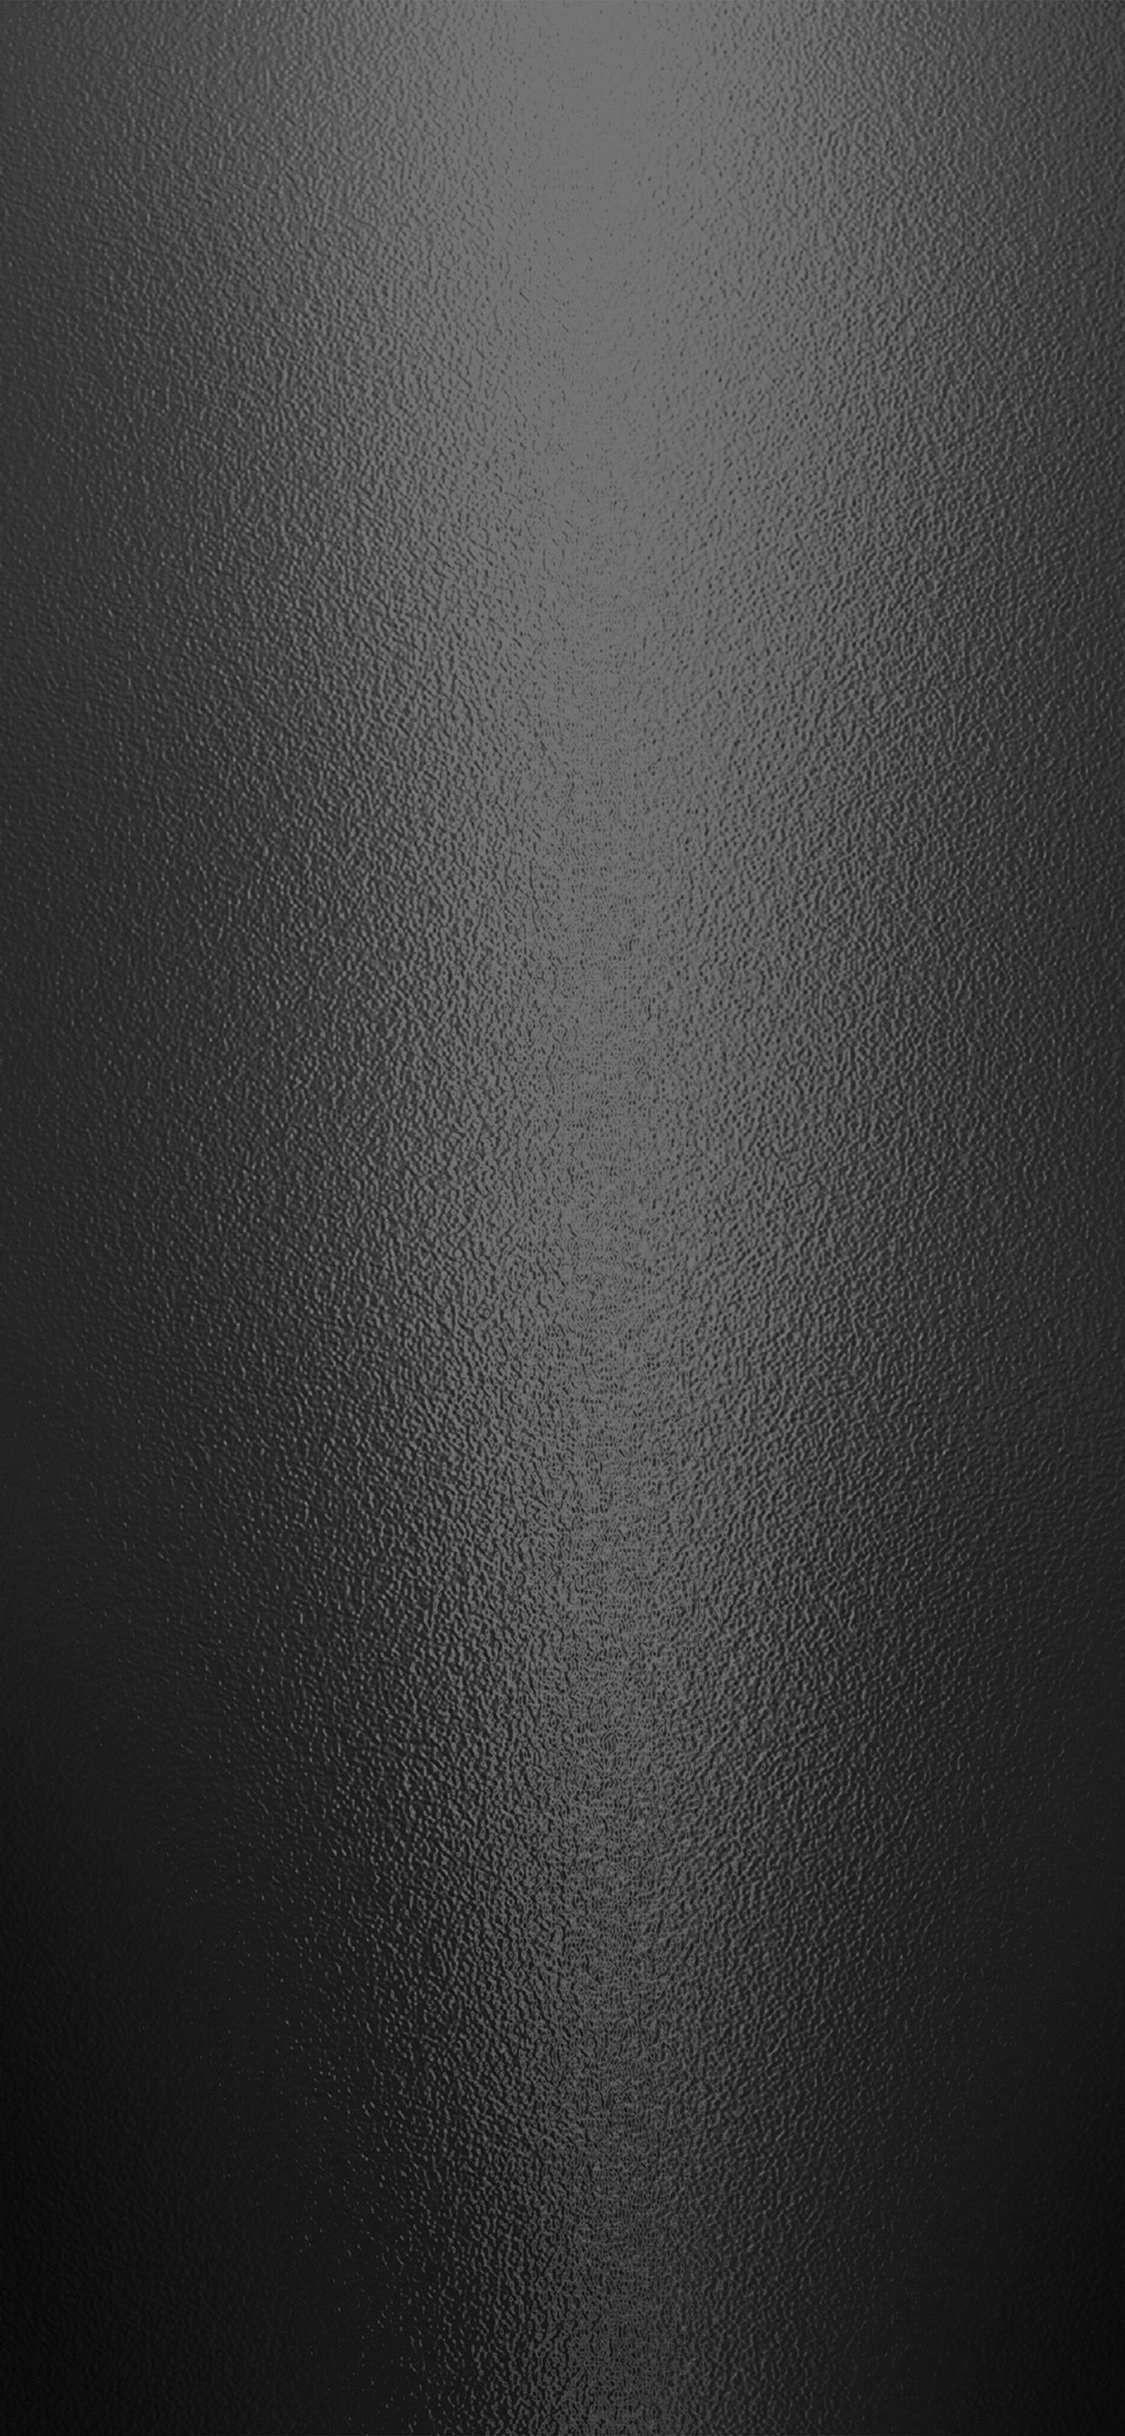 Black Apple Wallpaper Iphone X in 2020 Iphone wallpaper